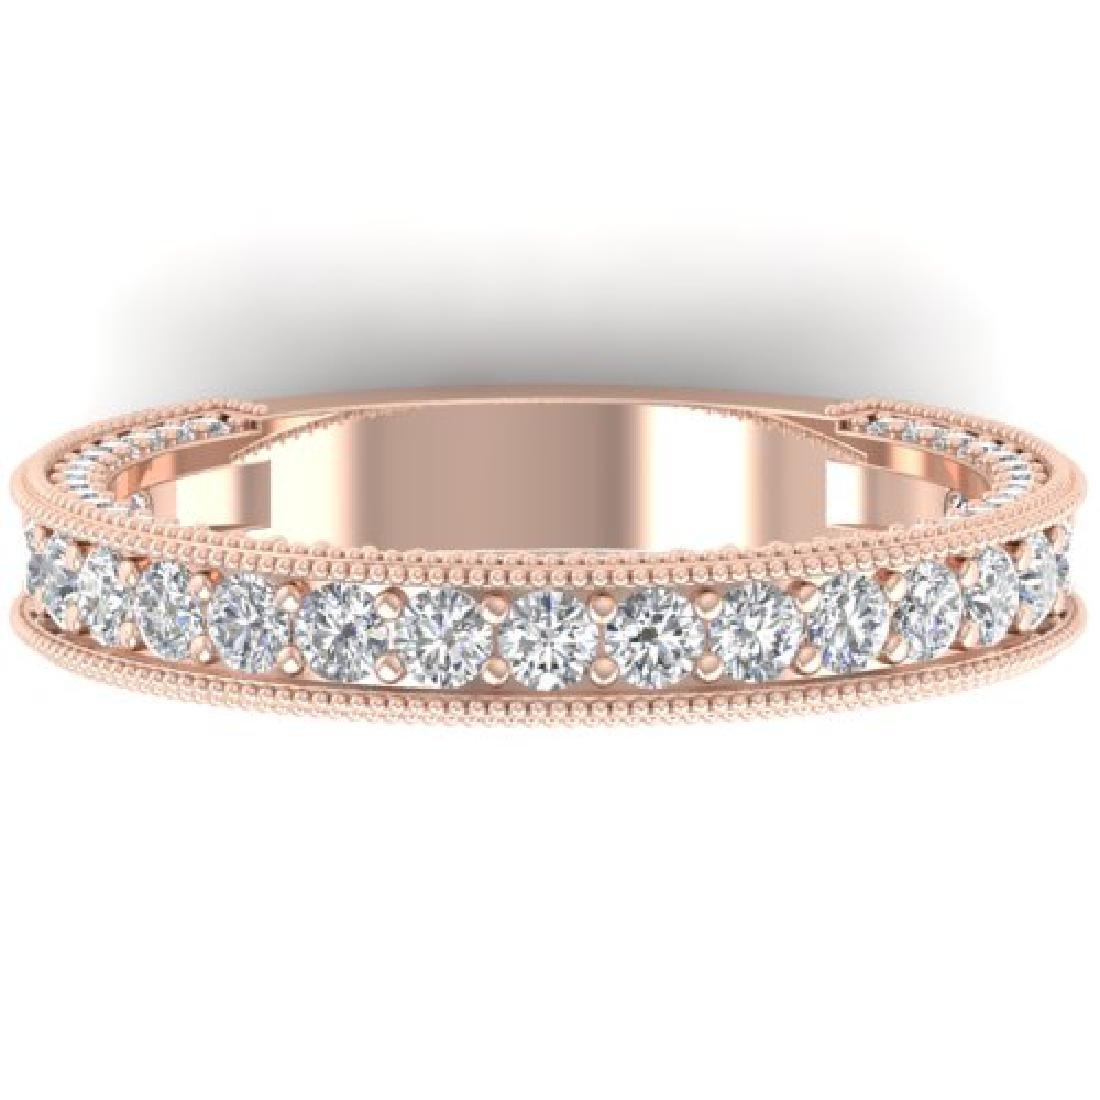 1.25 CTW VS/SI Diamond Art Deco Eternity Band Ring 18K